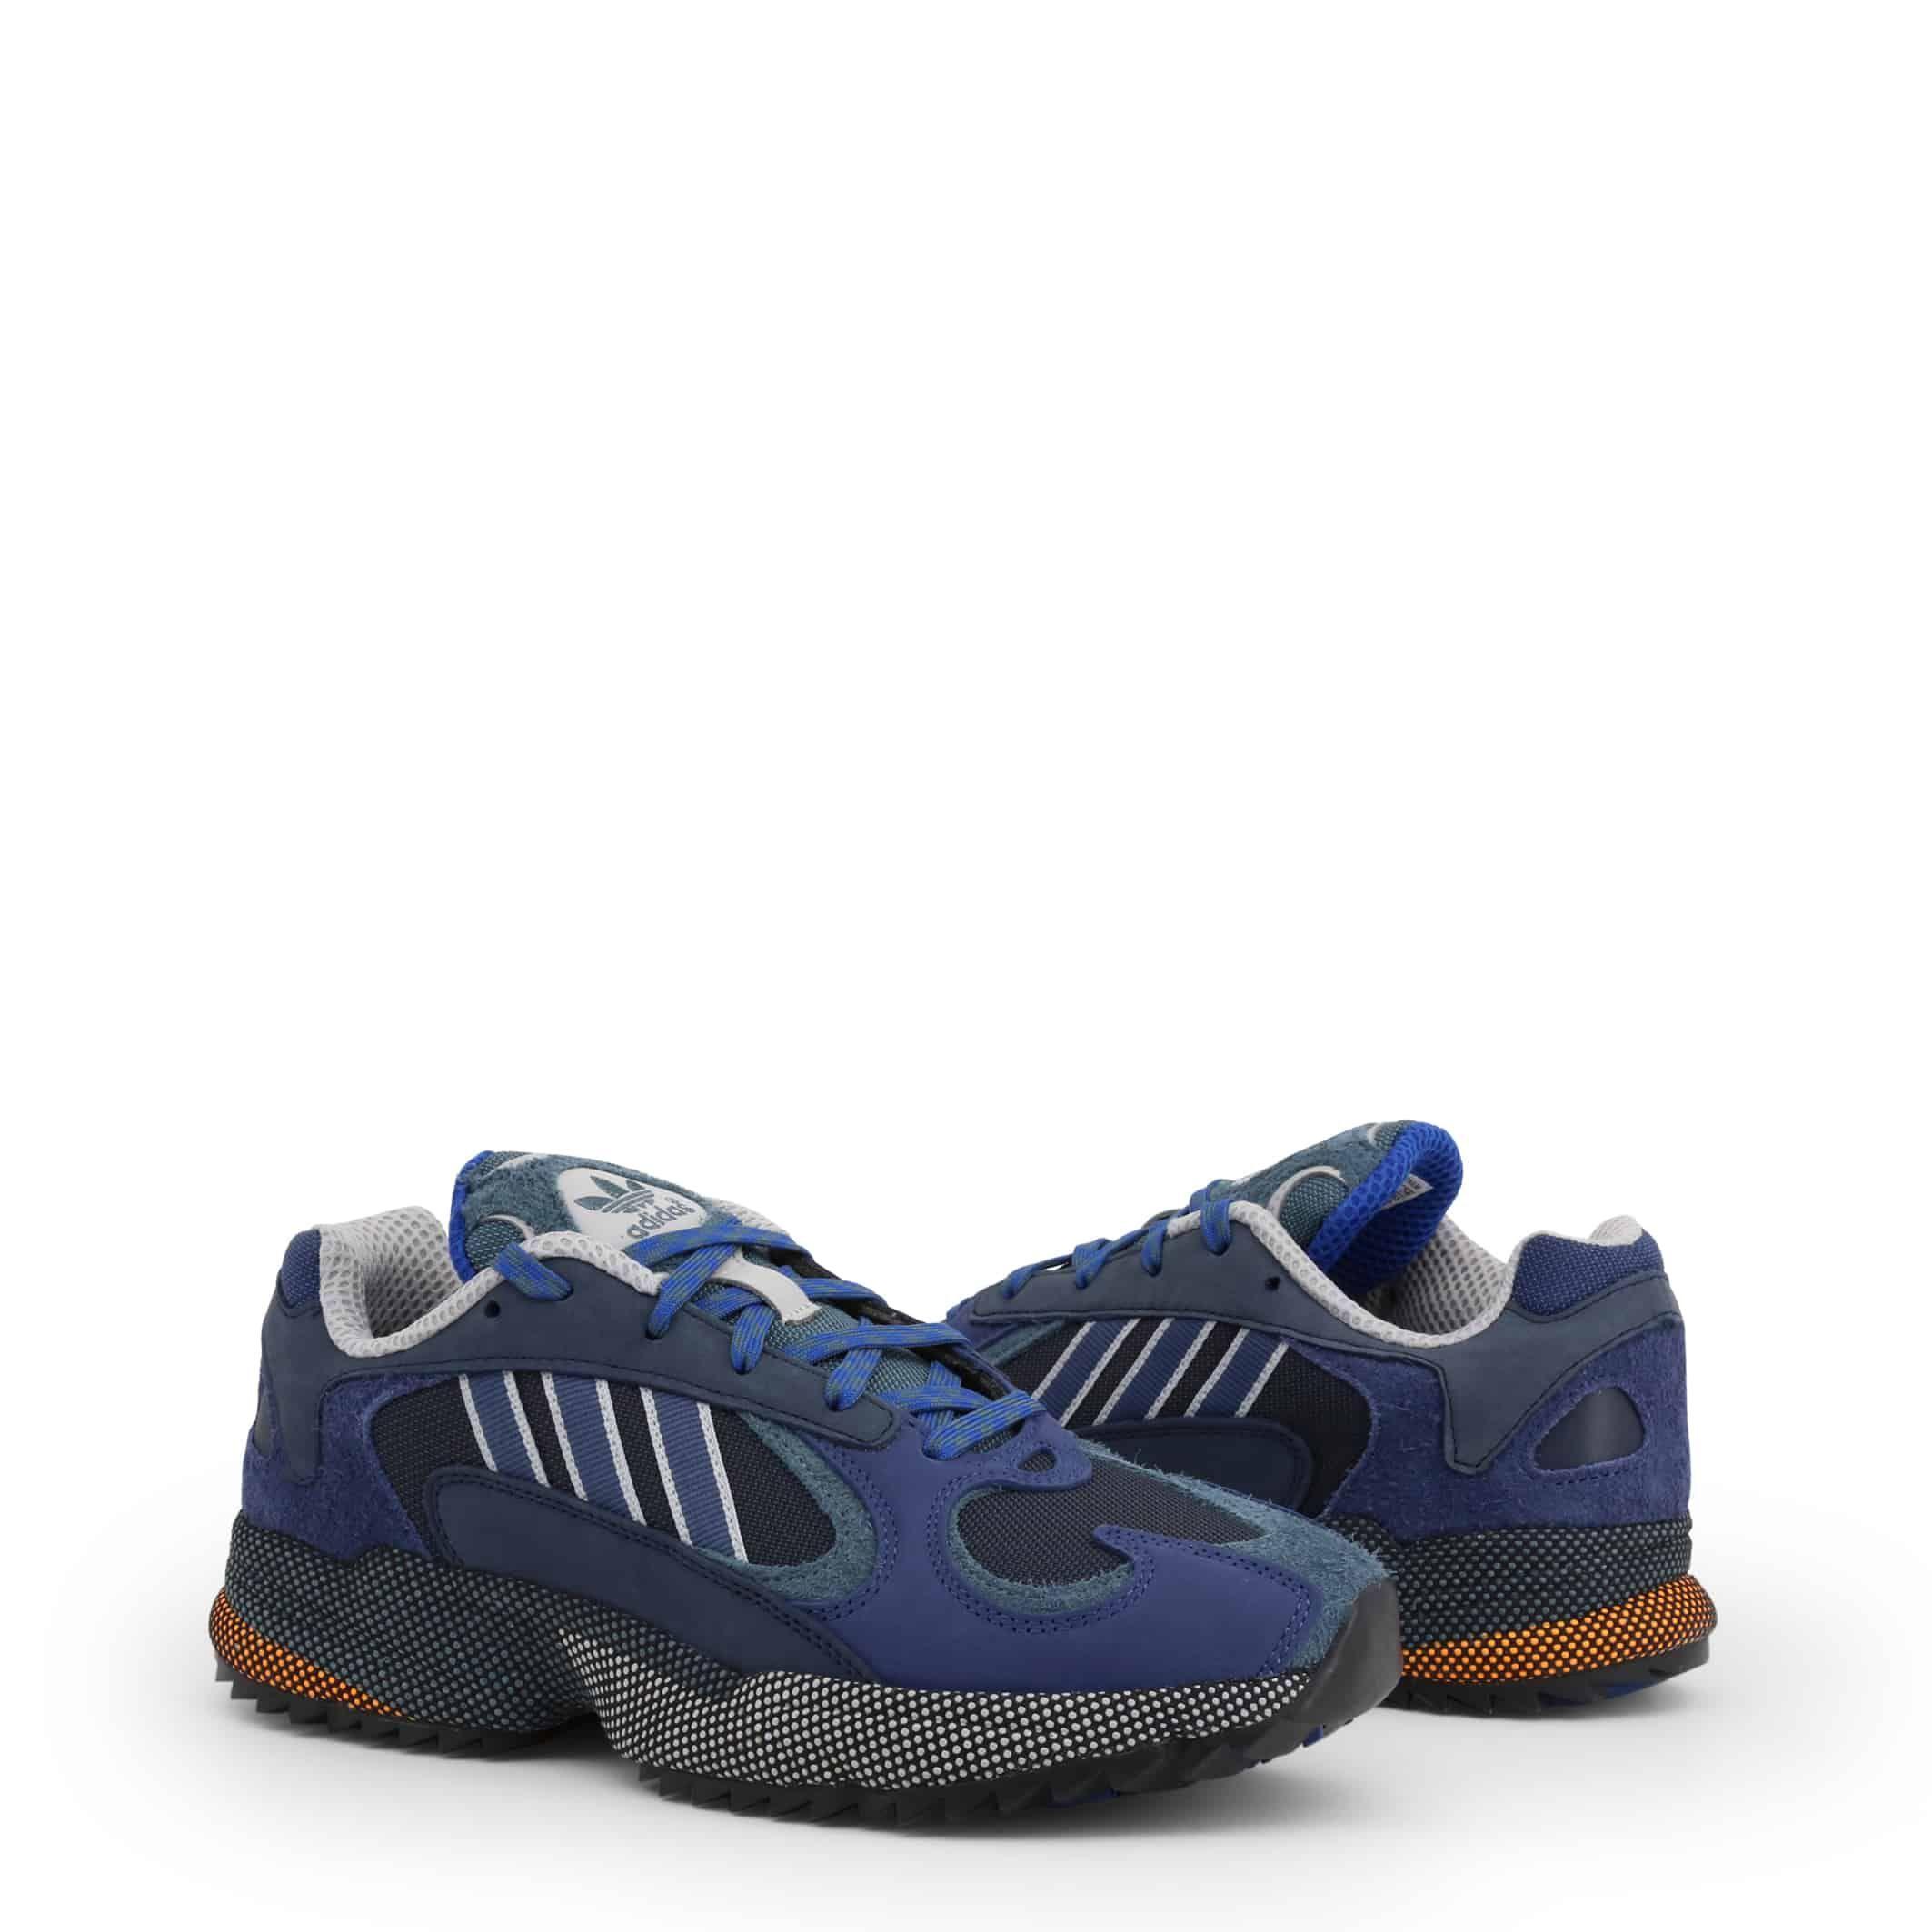 Adidas – YUNG-1 – Blauw Designeritems.nl